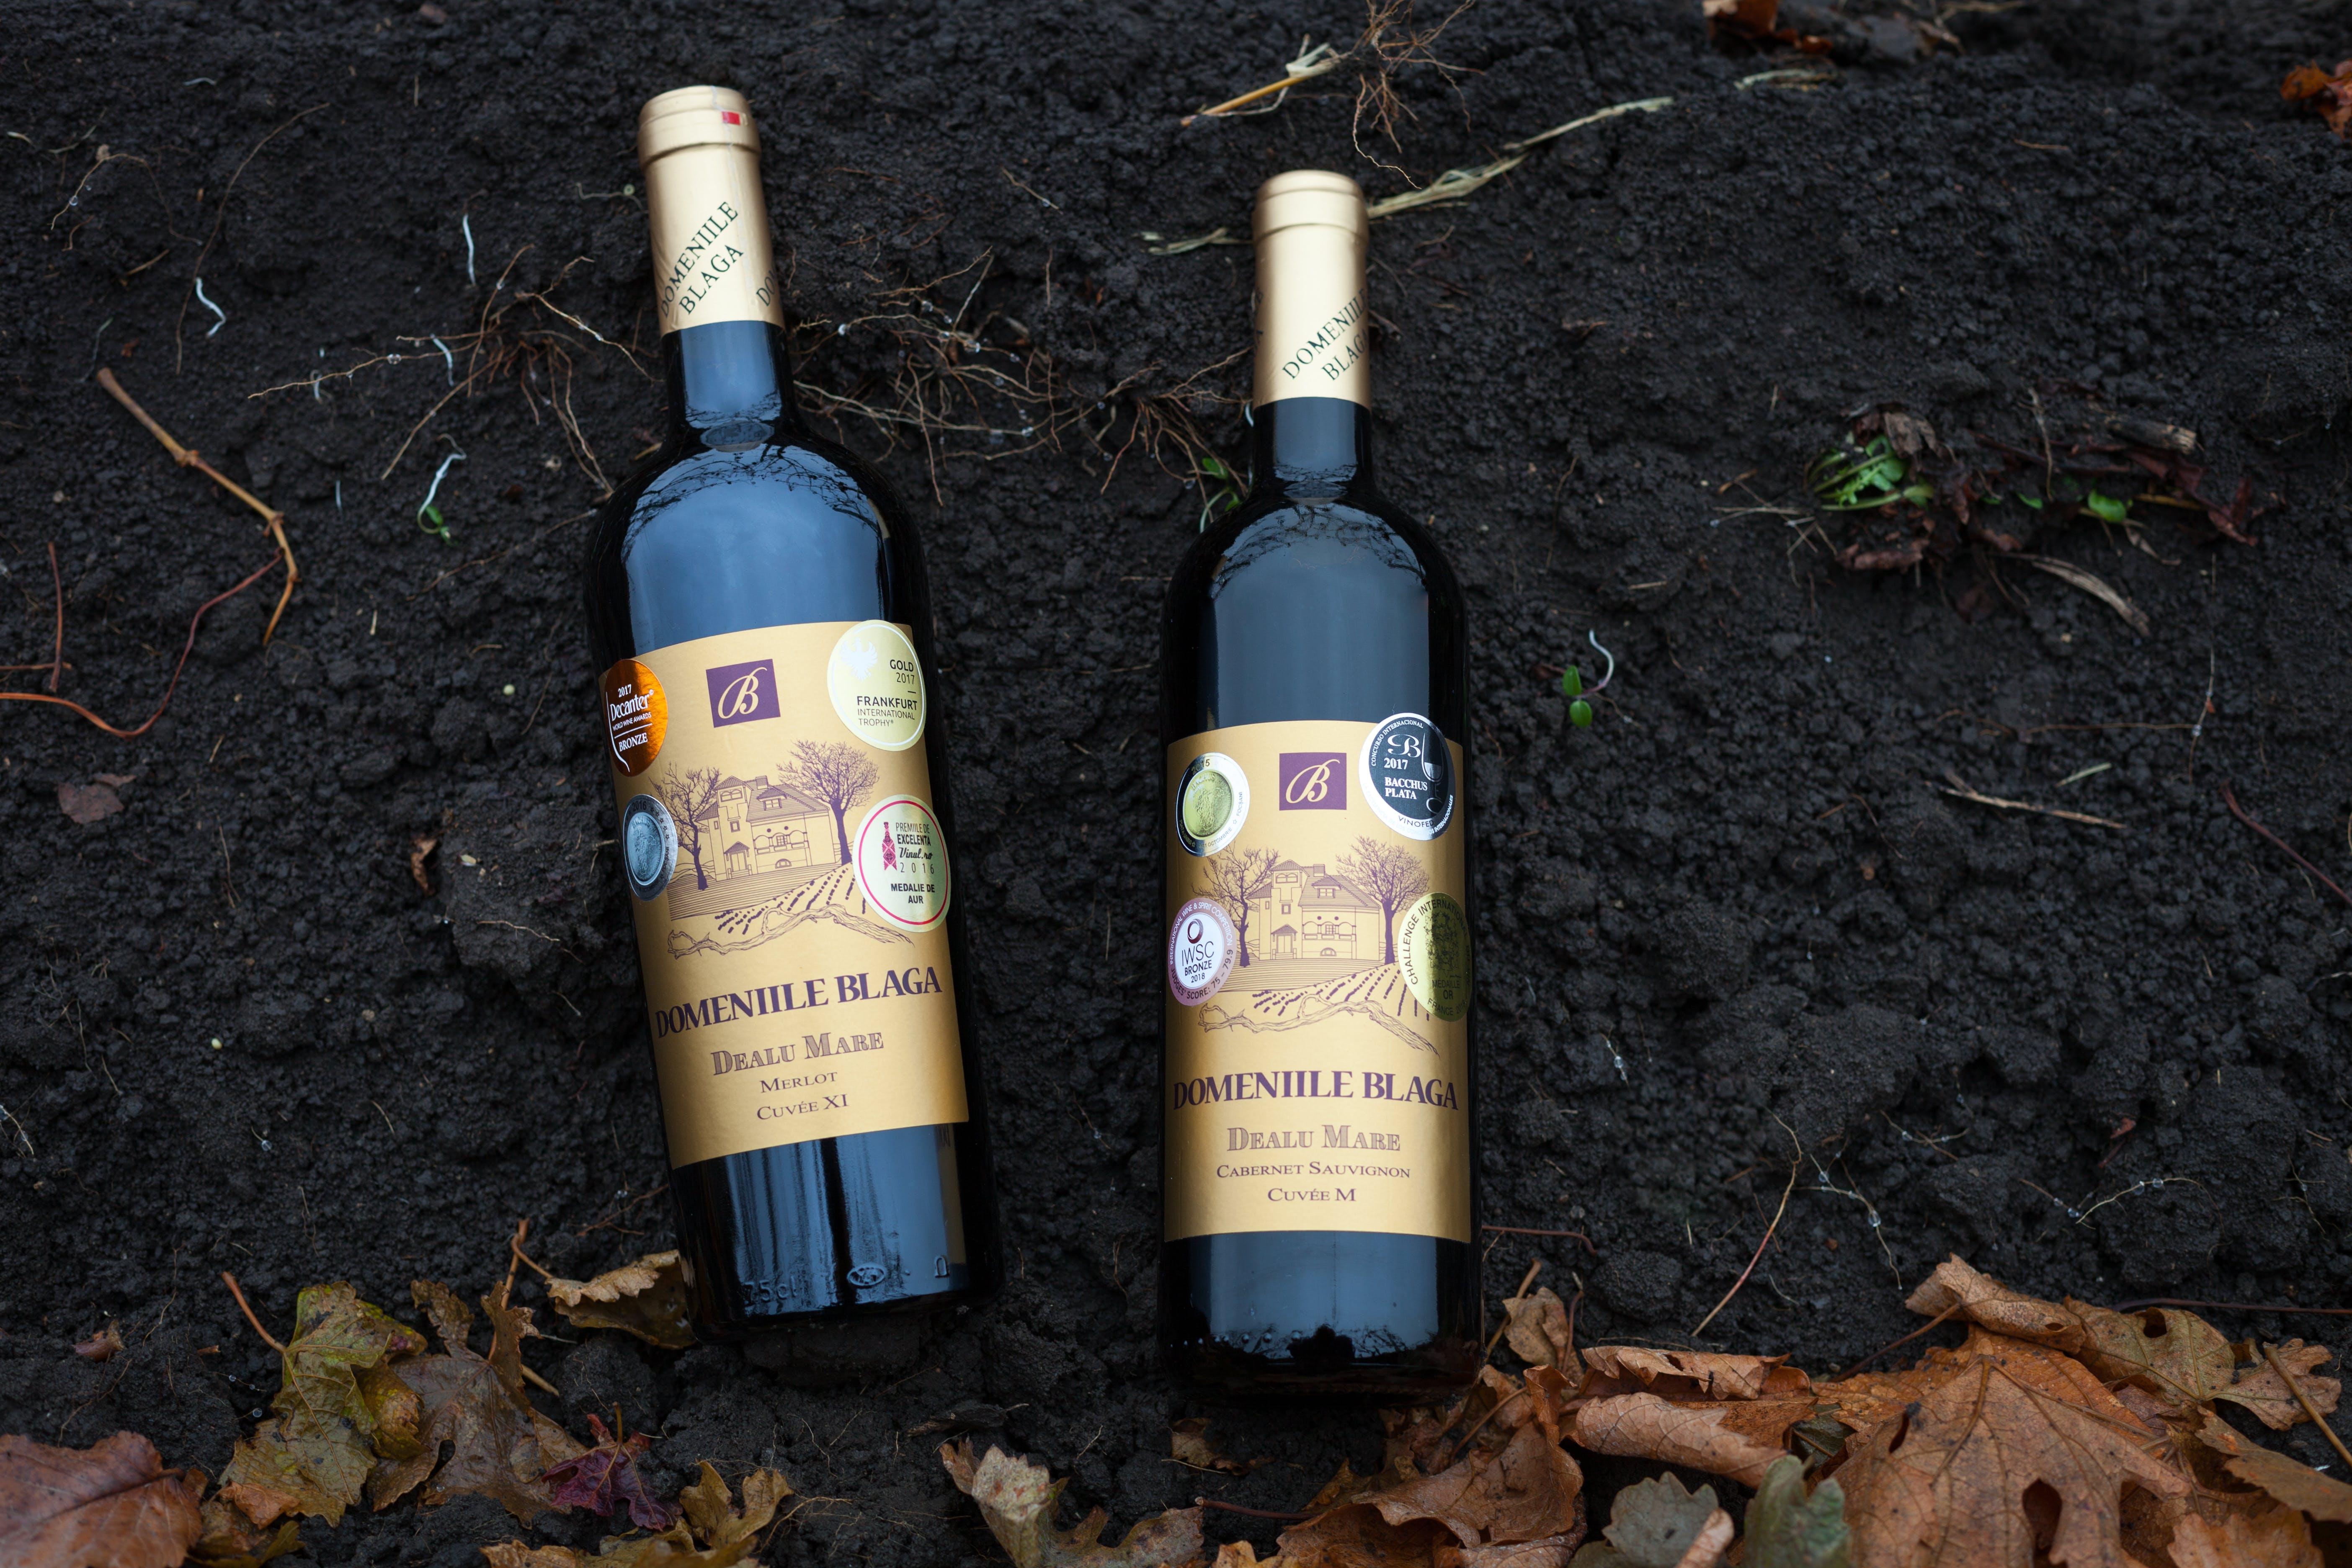 Free stock photo of bottle, Cabernet, dealu mare, domeniile blaga